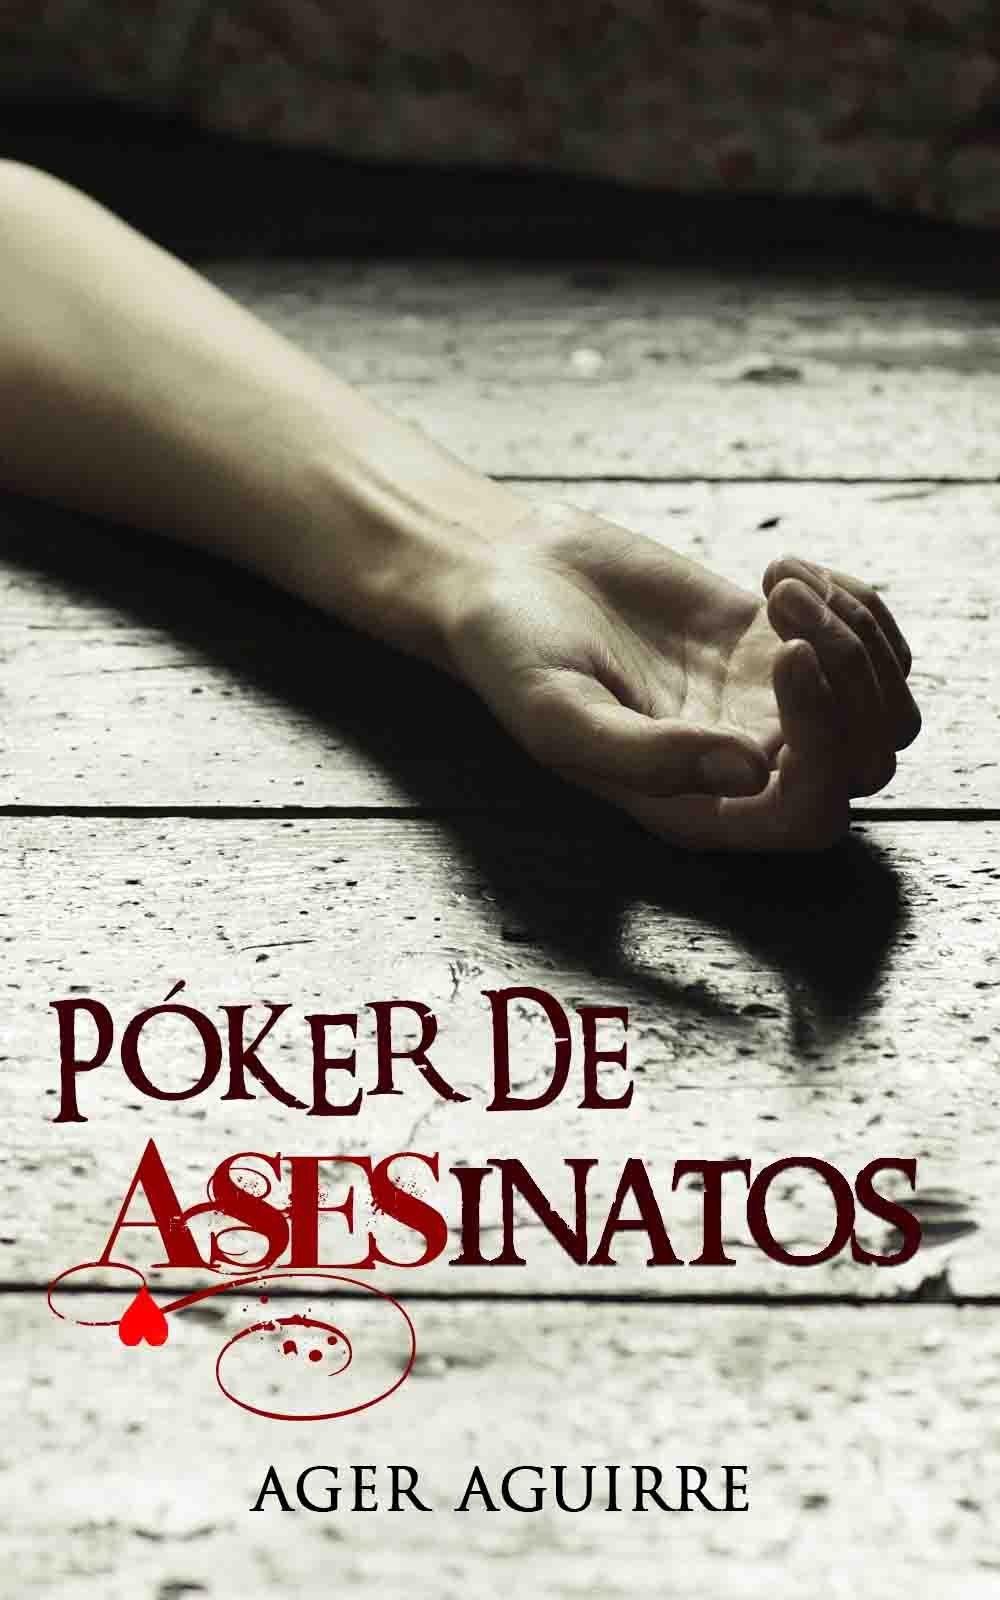 Póker de Asesinatos Finalista premio literario amazon 2018